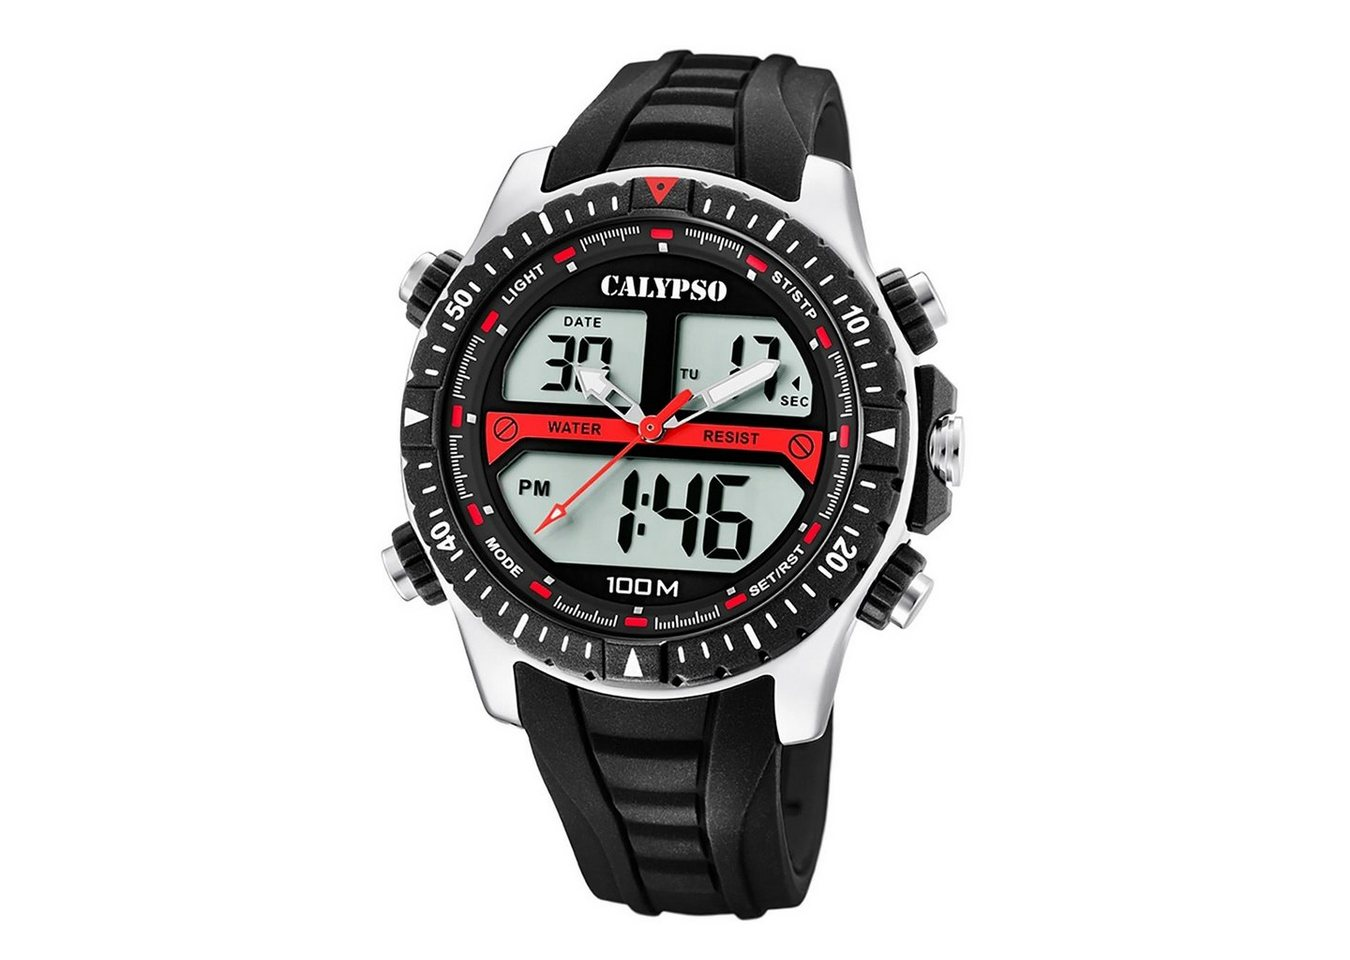 calypso watches -  Digitaluhr »UK5773/4 Calypso Herren Uhr K5773/4«, (Analog-Digital), Herren Armbanduhr rund, Kunststoff, PUarmband schwarz, Sport